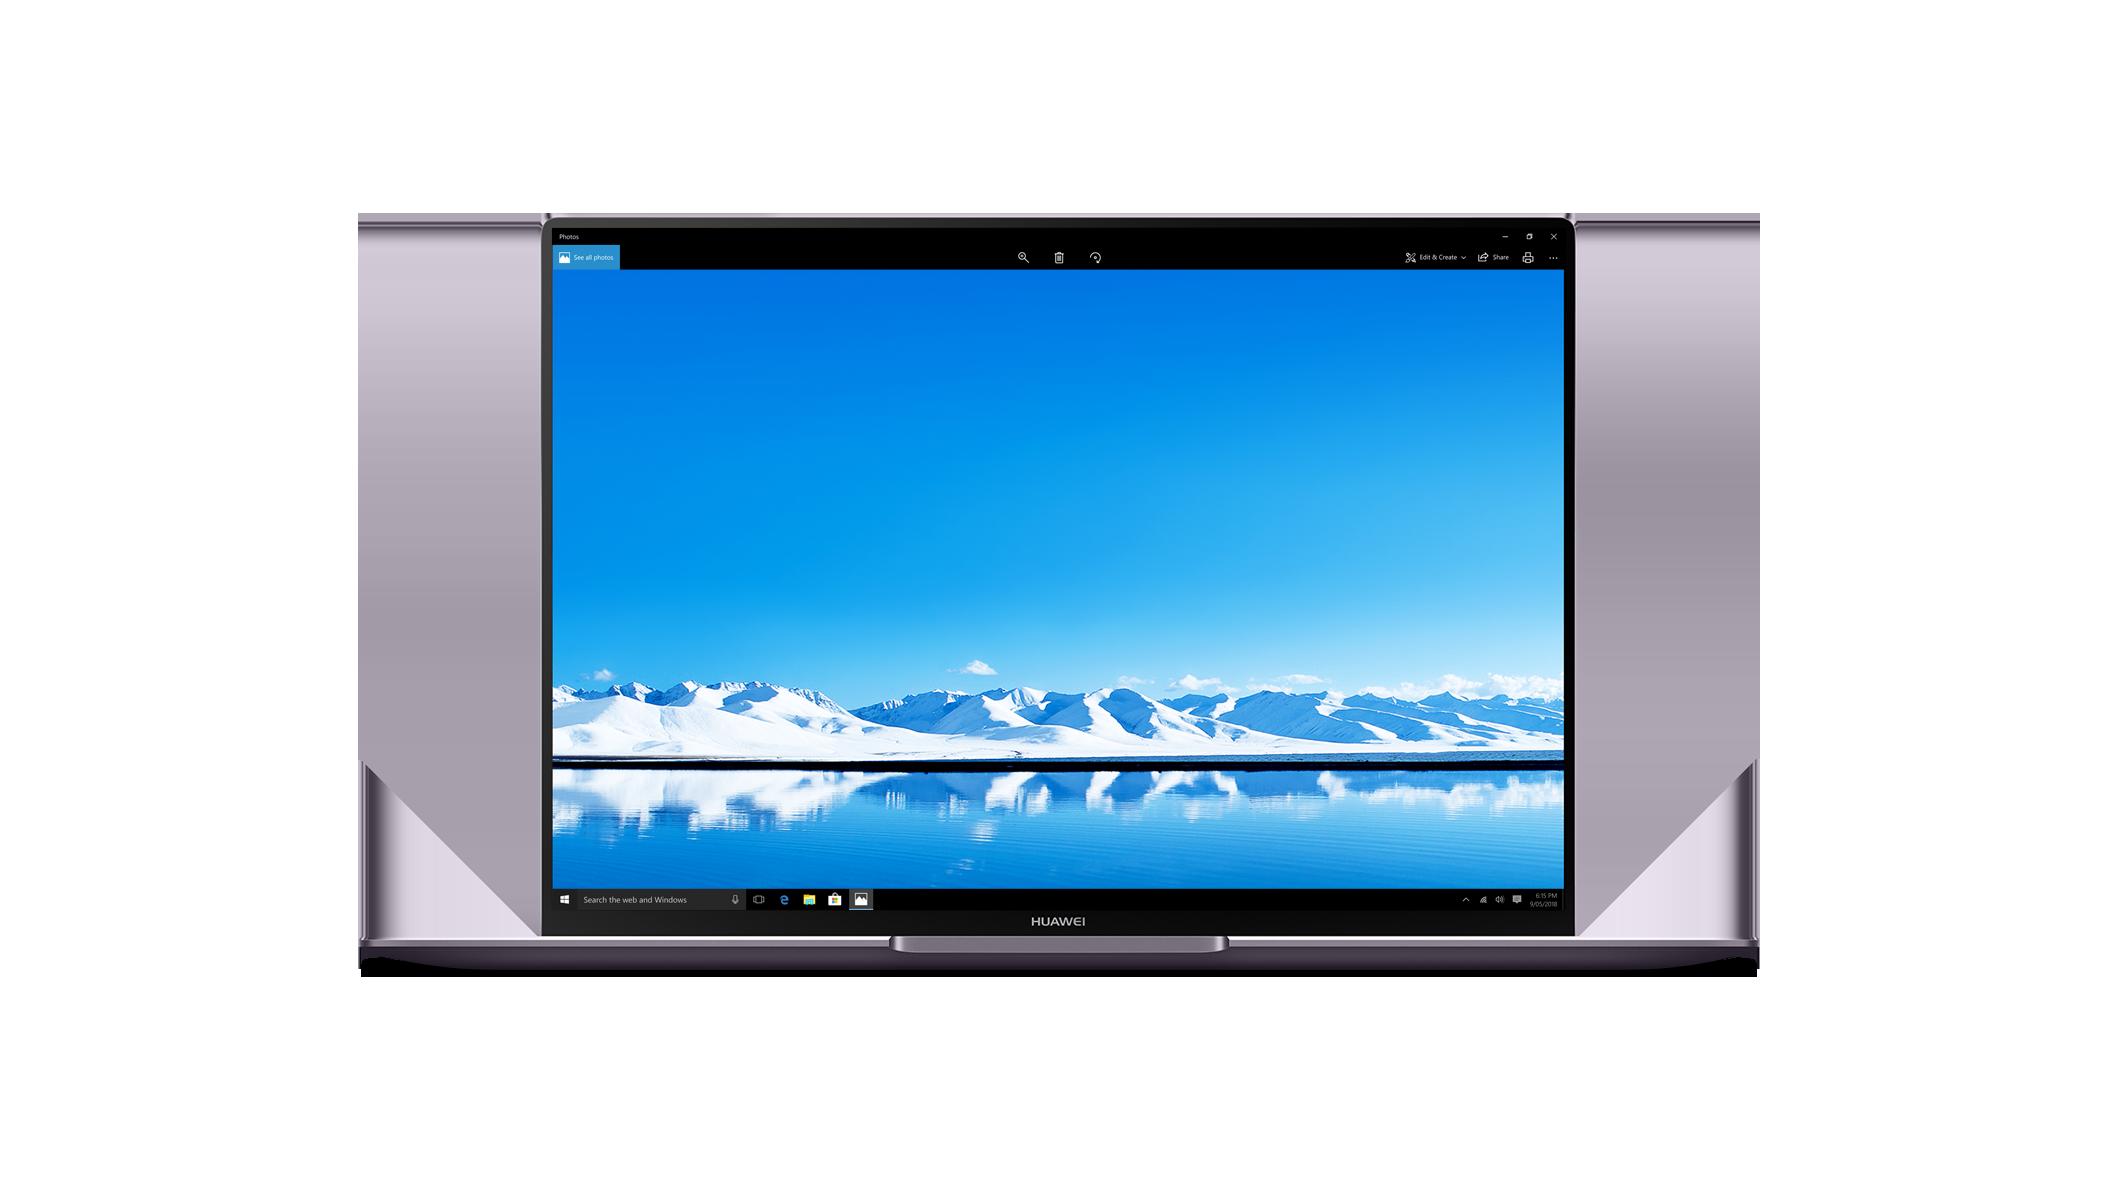 Buy Huawei Matebook X Pro Laptop Microsoft Store